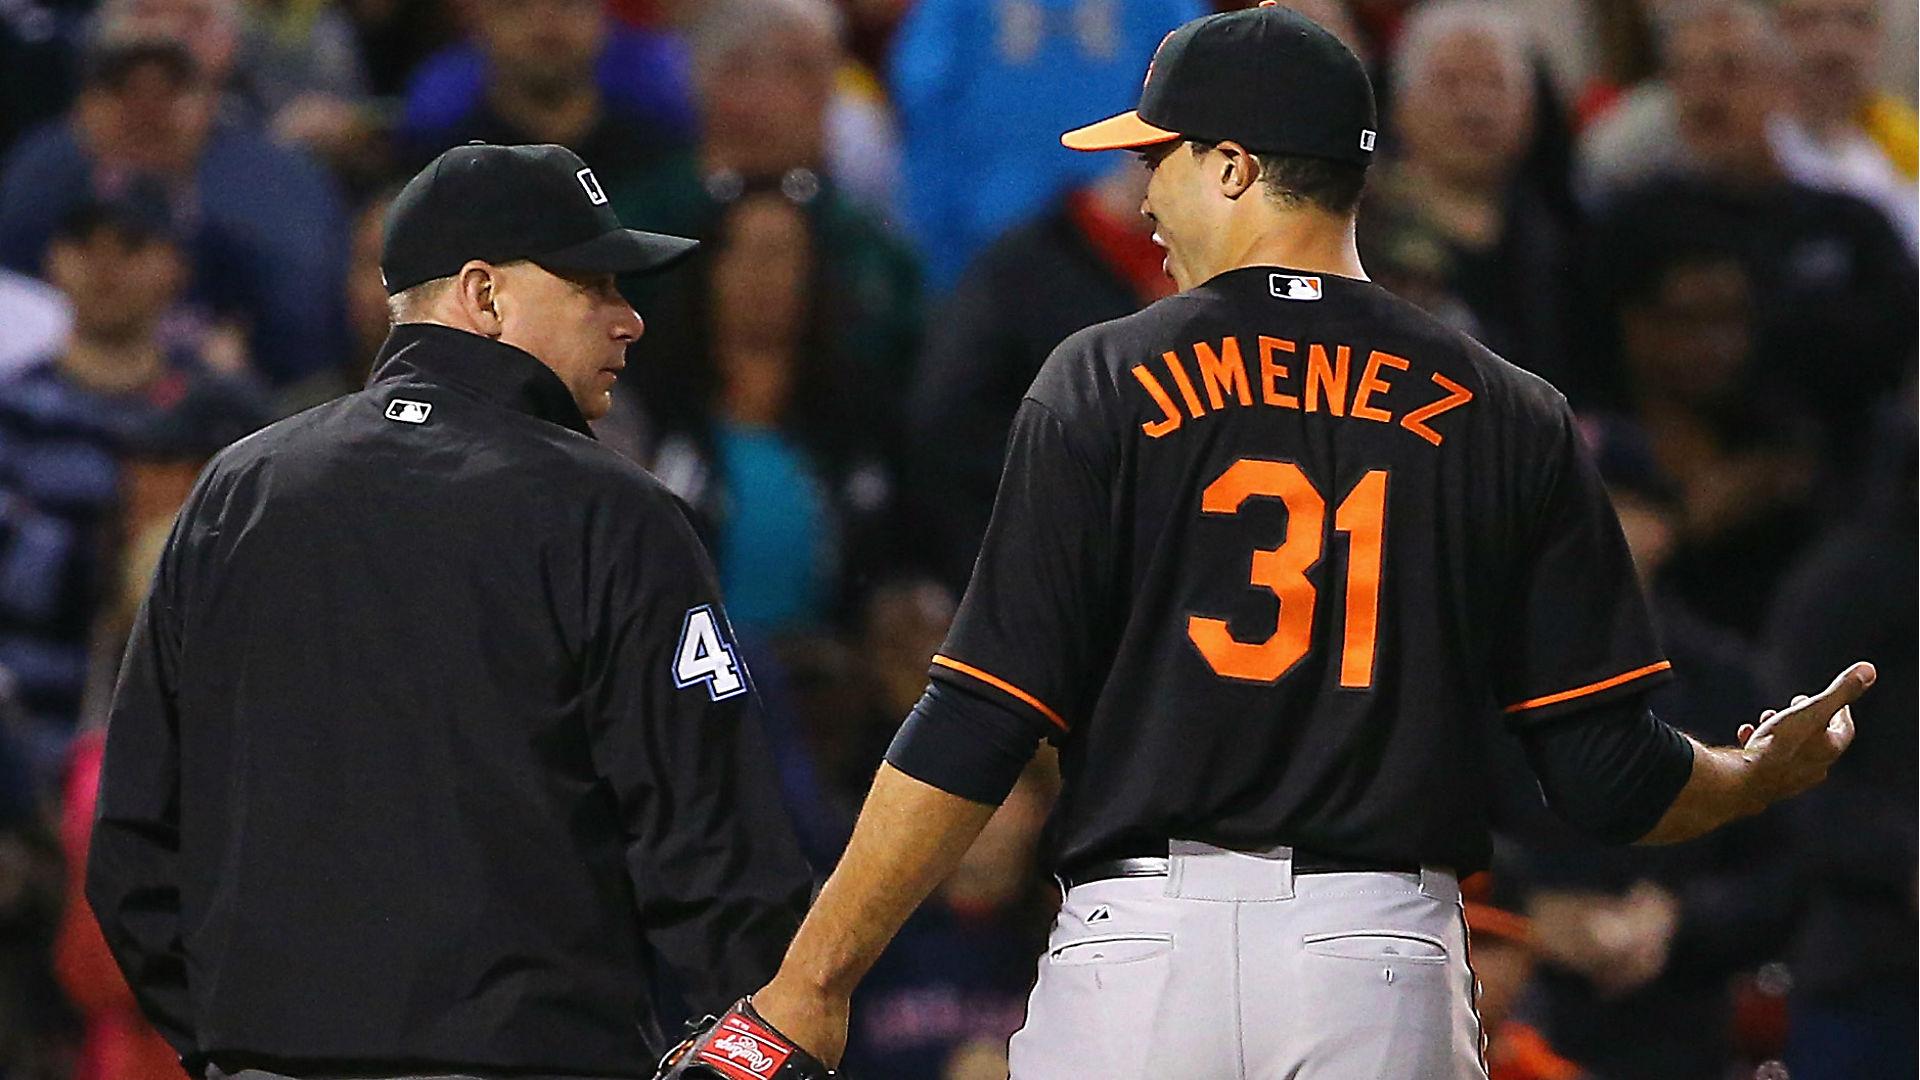 Orioles' Ubaldo Jimenez ejected after plunking Pablo Sandoval